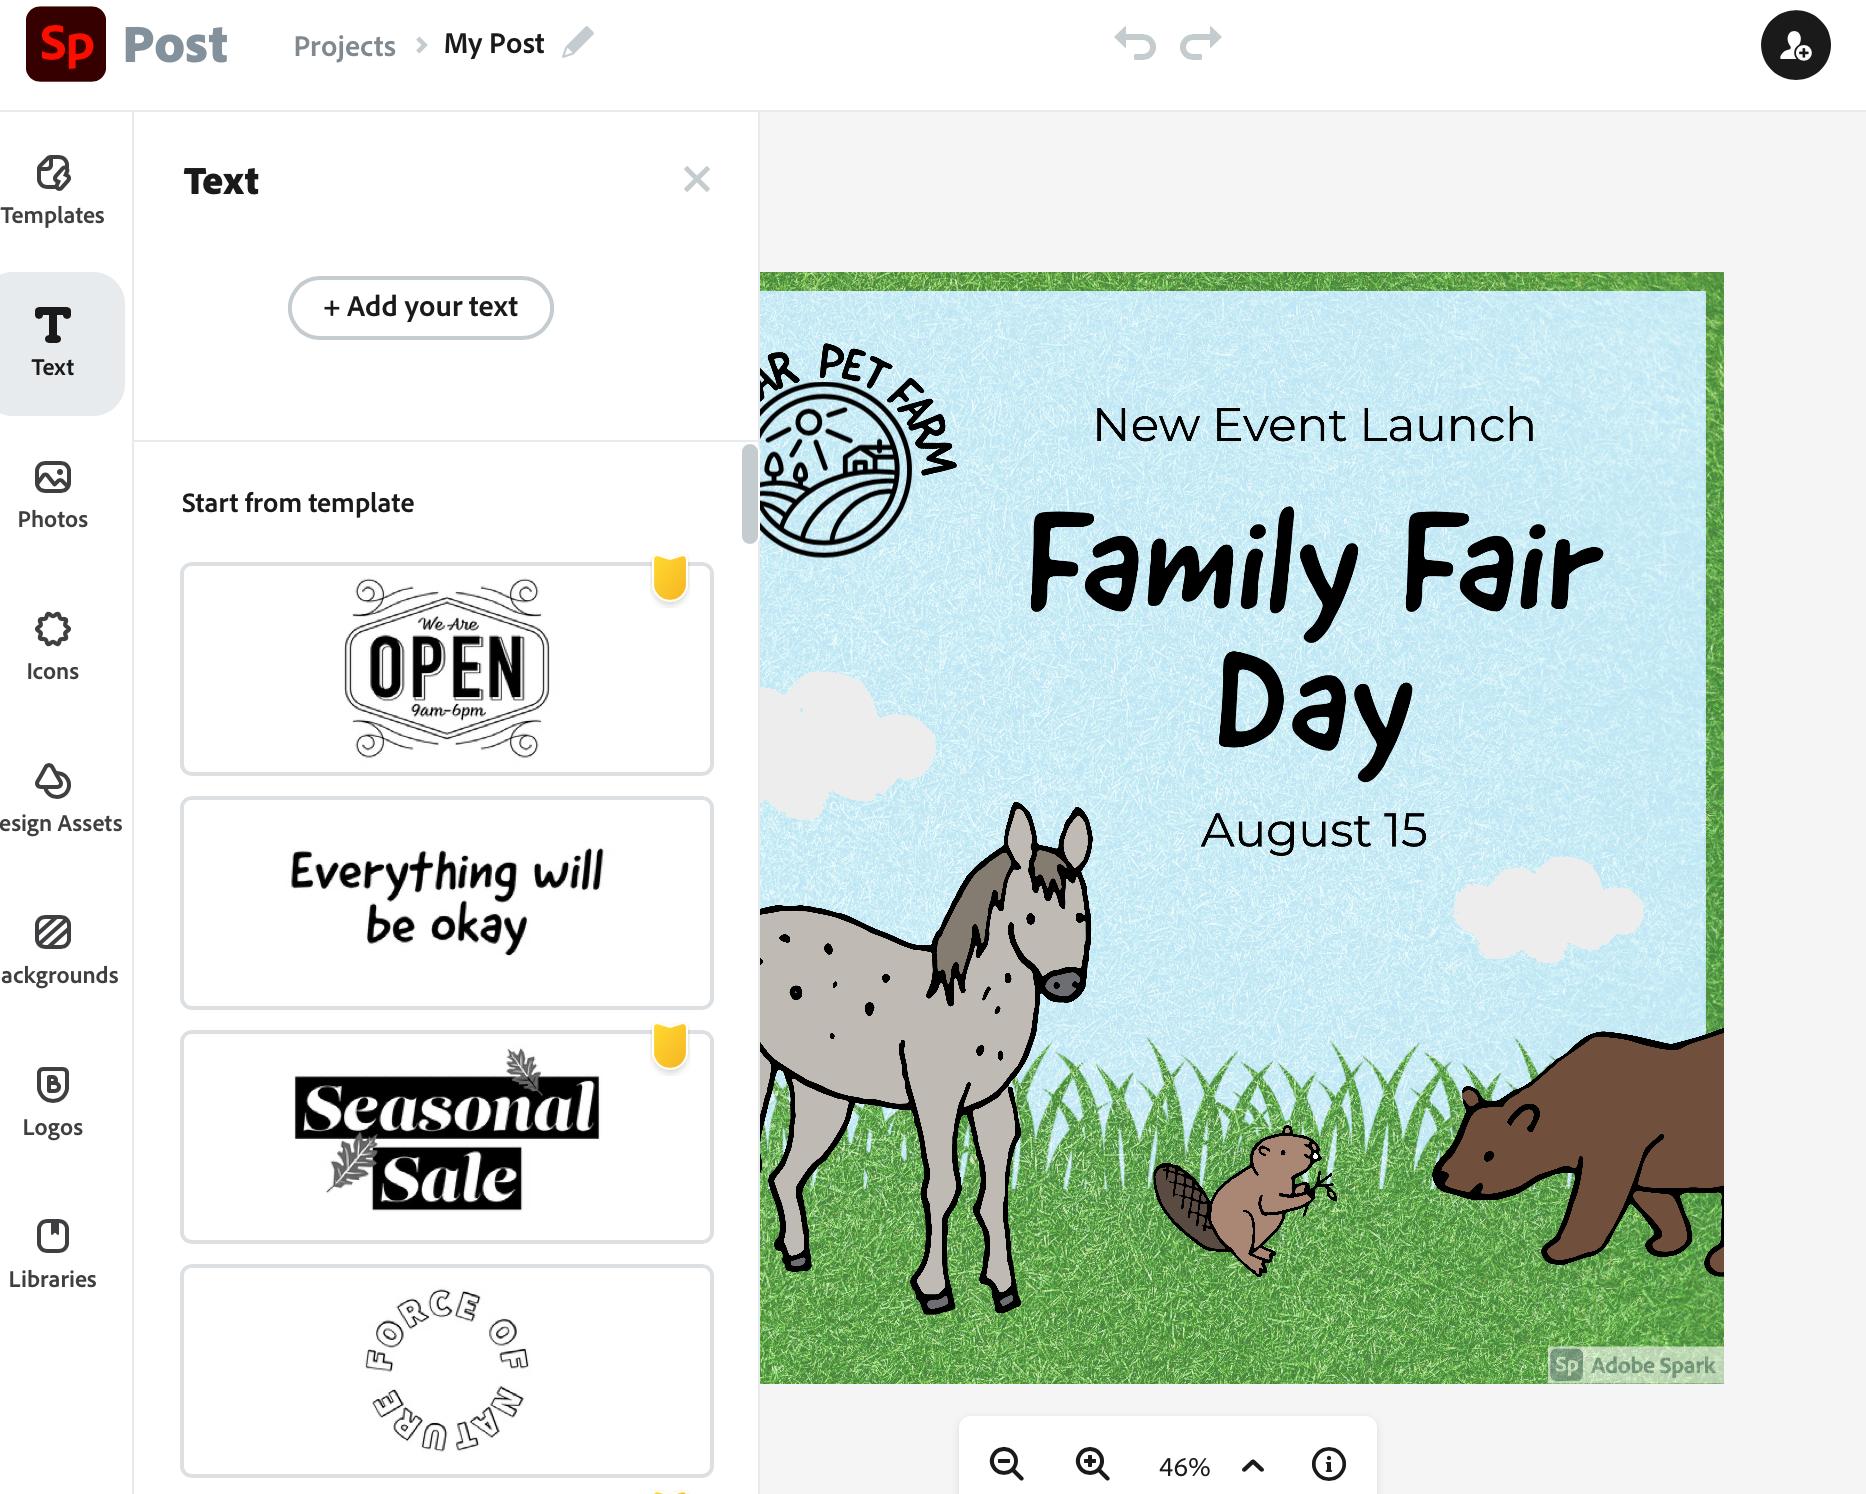 Adobe Spark Instagram Ad design tool